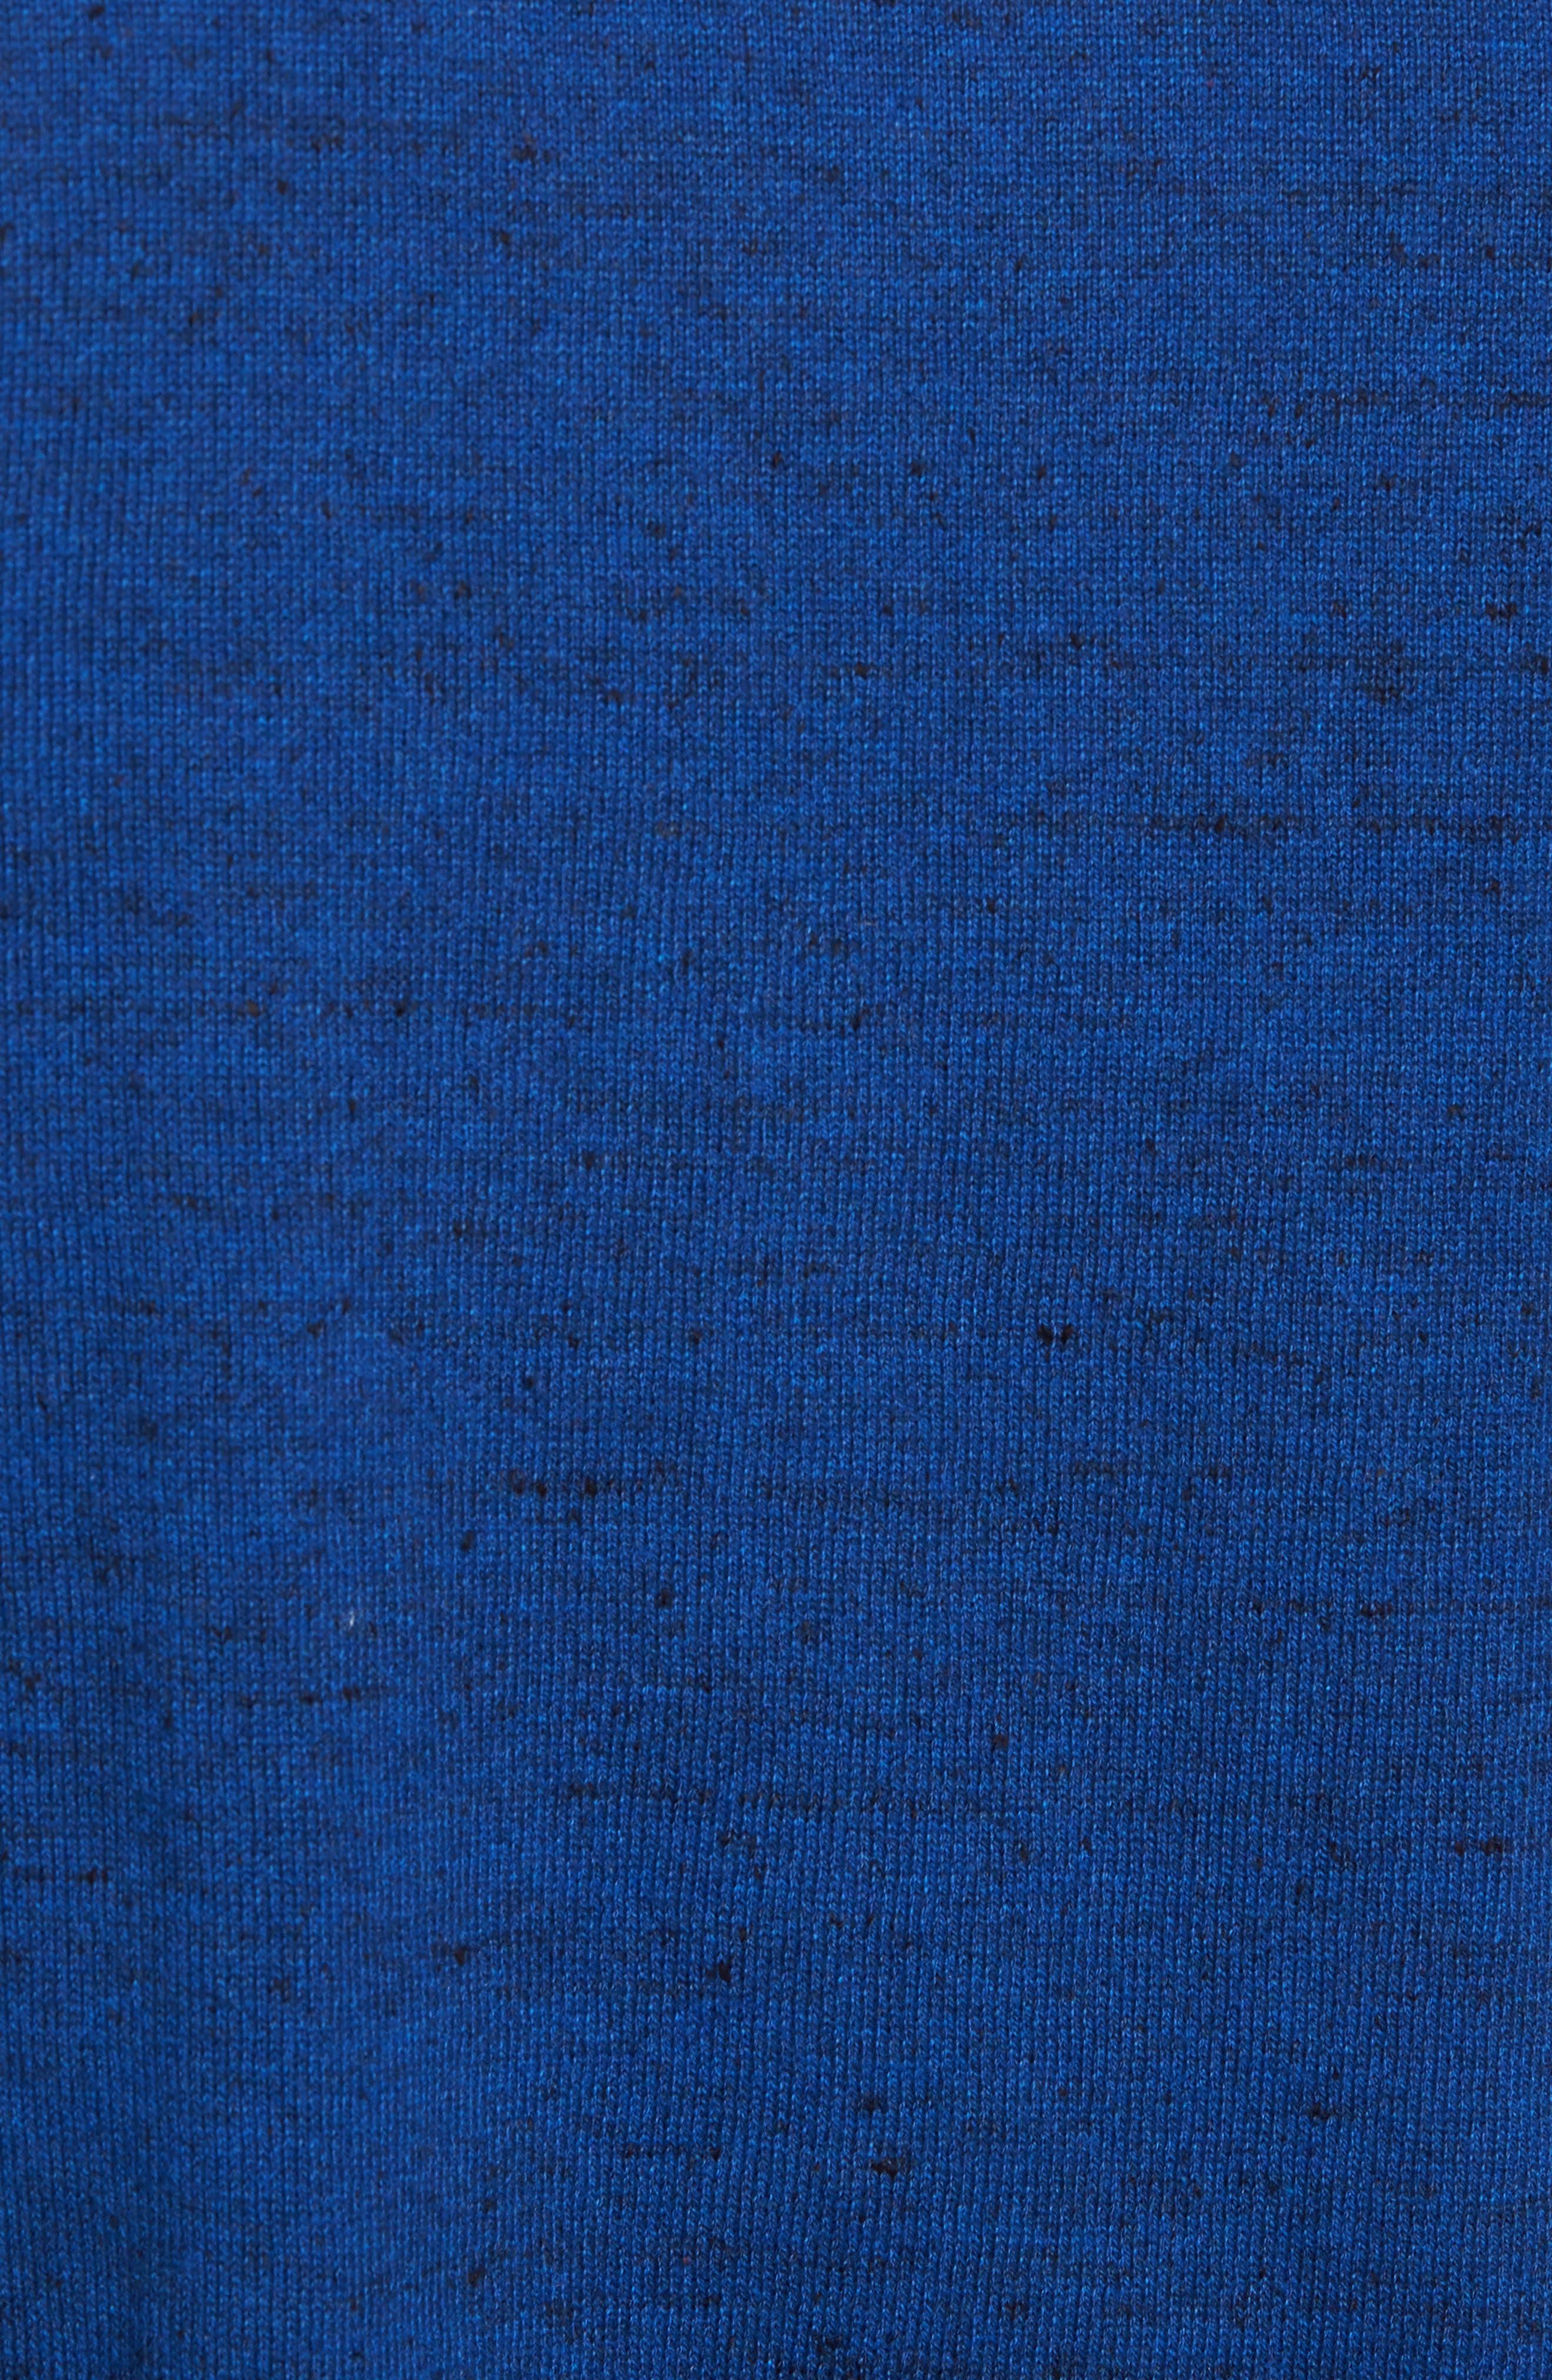 Alternate Image 5  - Nordstrom Men's Shop Cotton & Cashmere Crewneck Sweater (Regular & Tall)